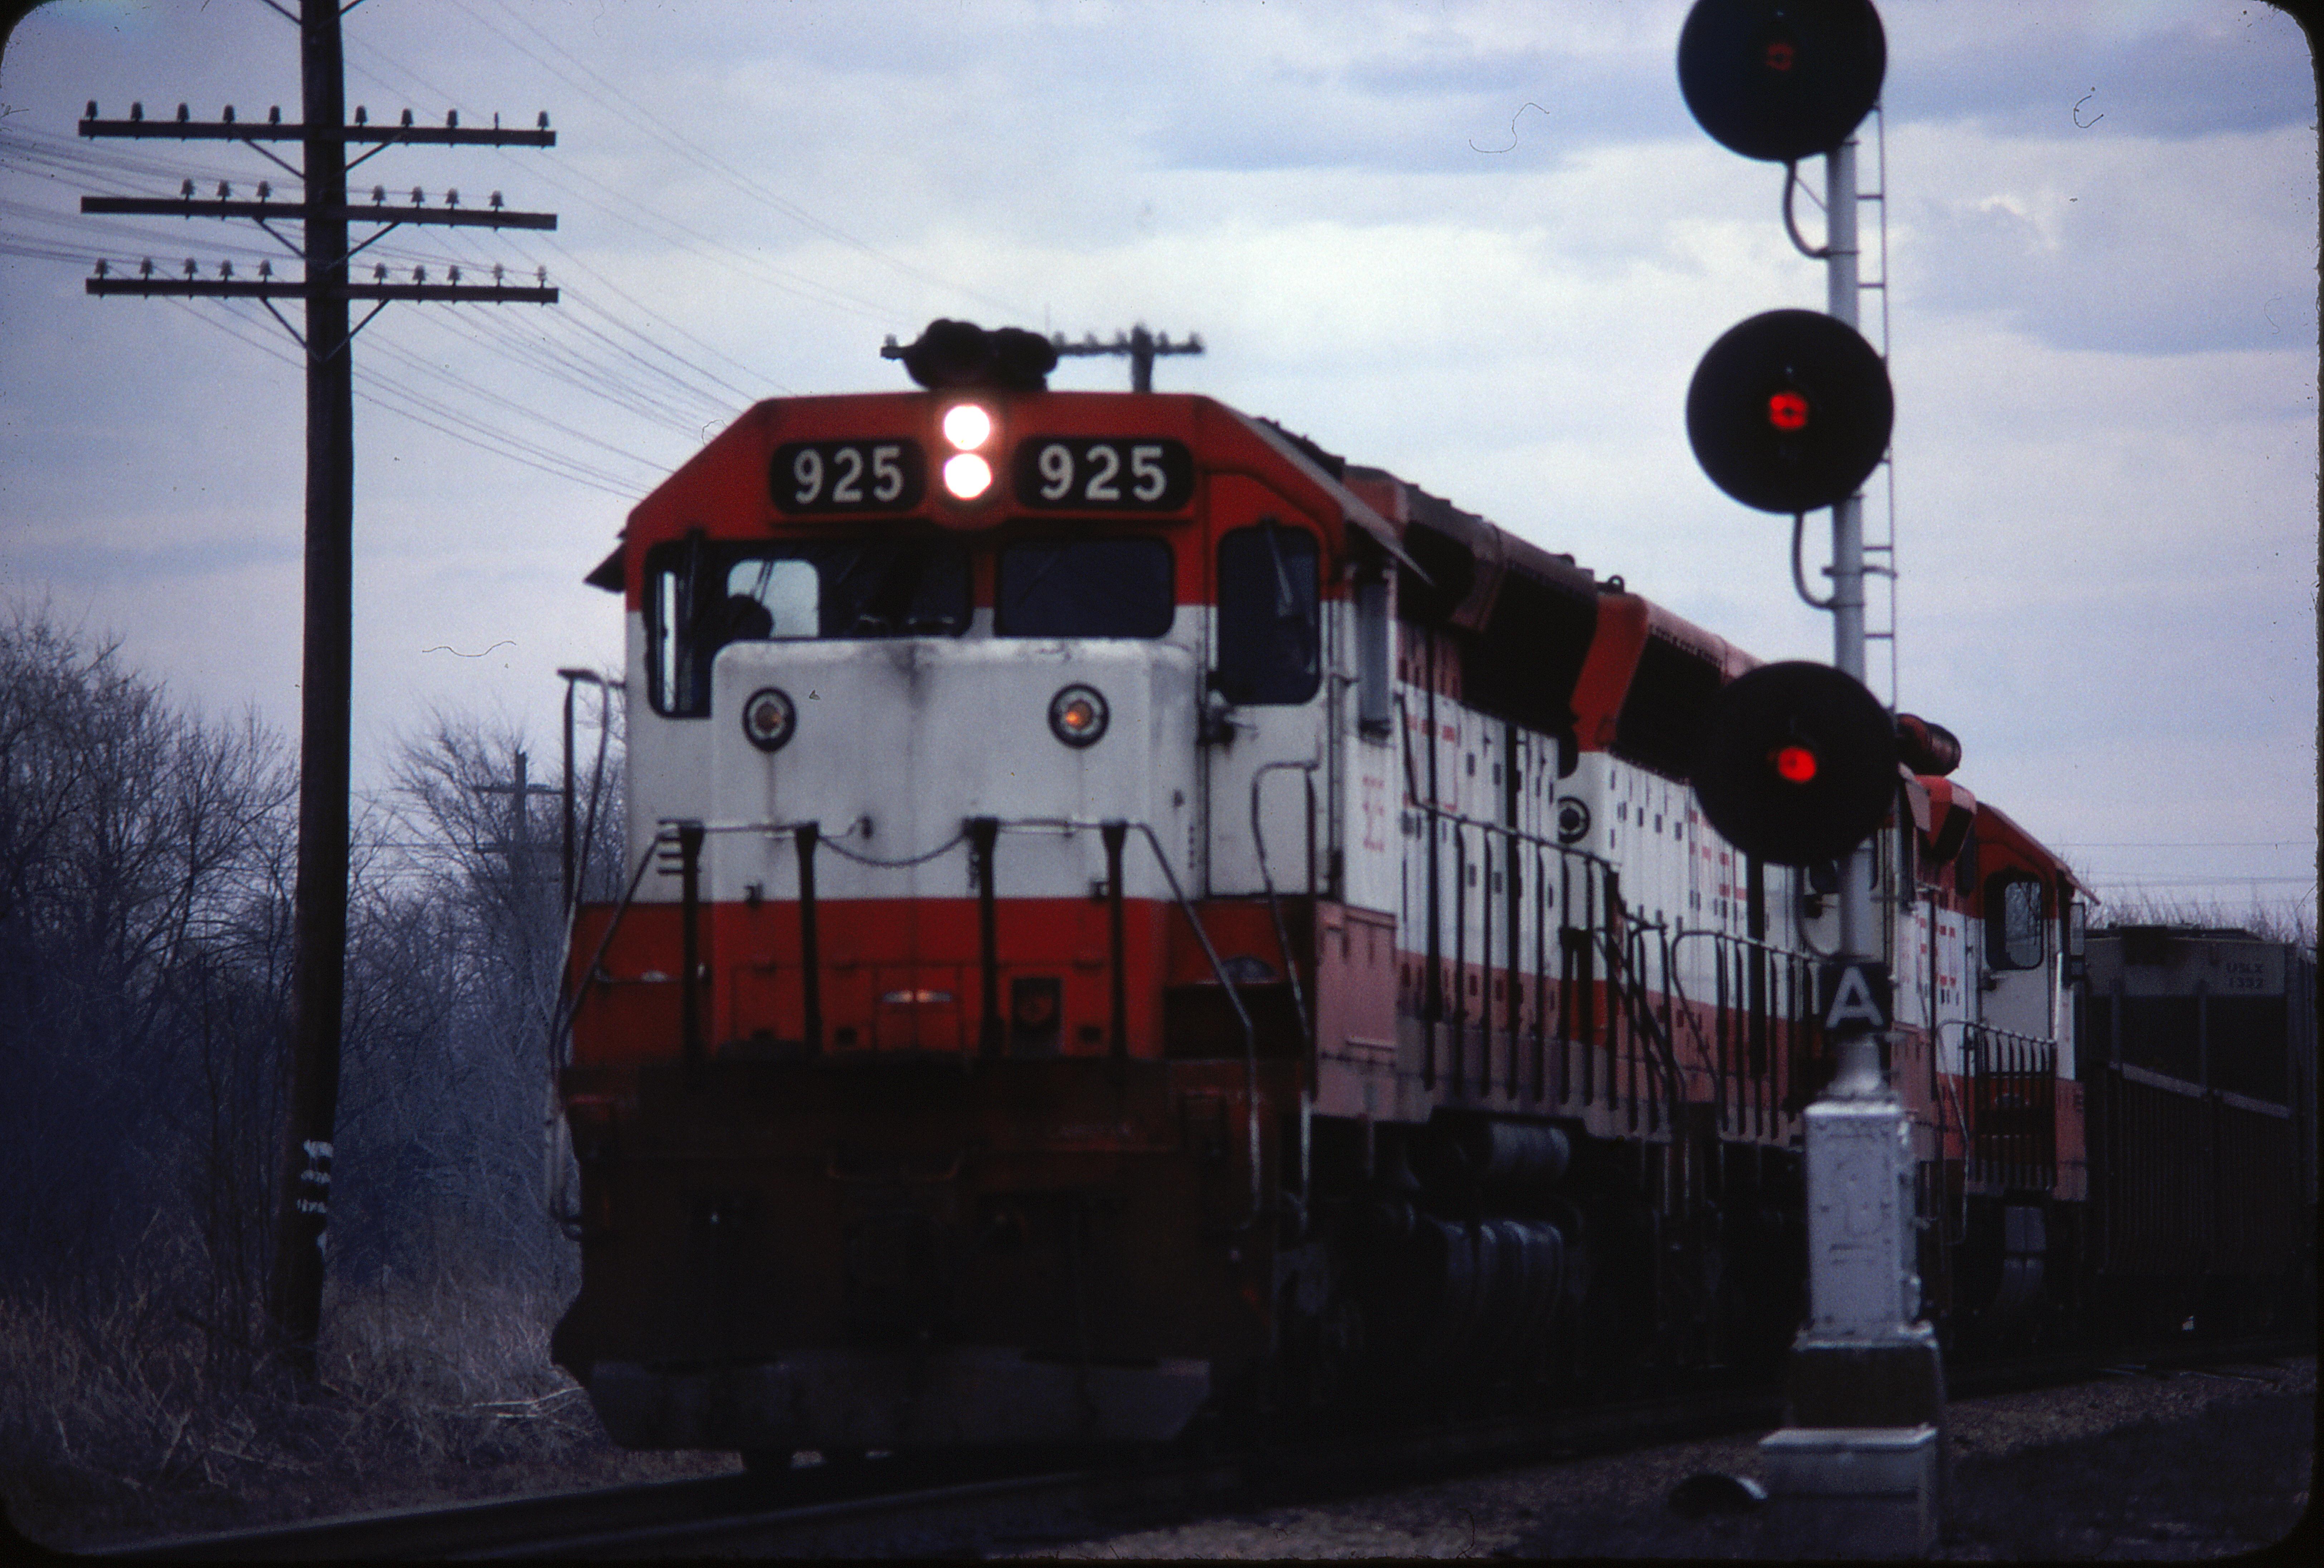 SD45 925 at Nichols Junction, Springfield, Missouri in March 1980 (Ken McElreath)